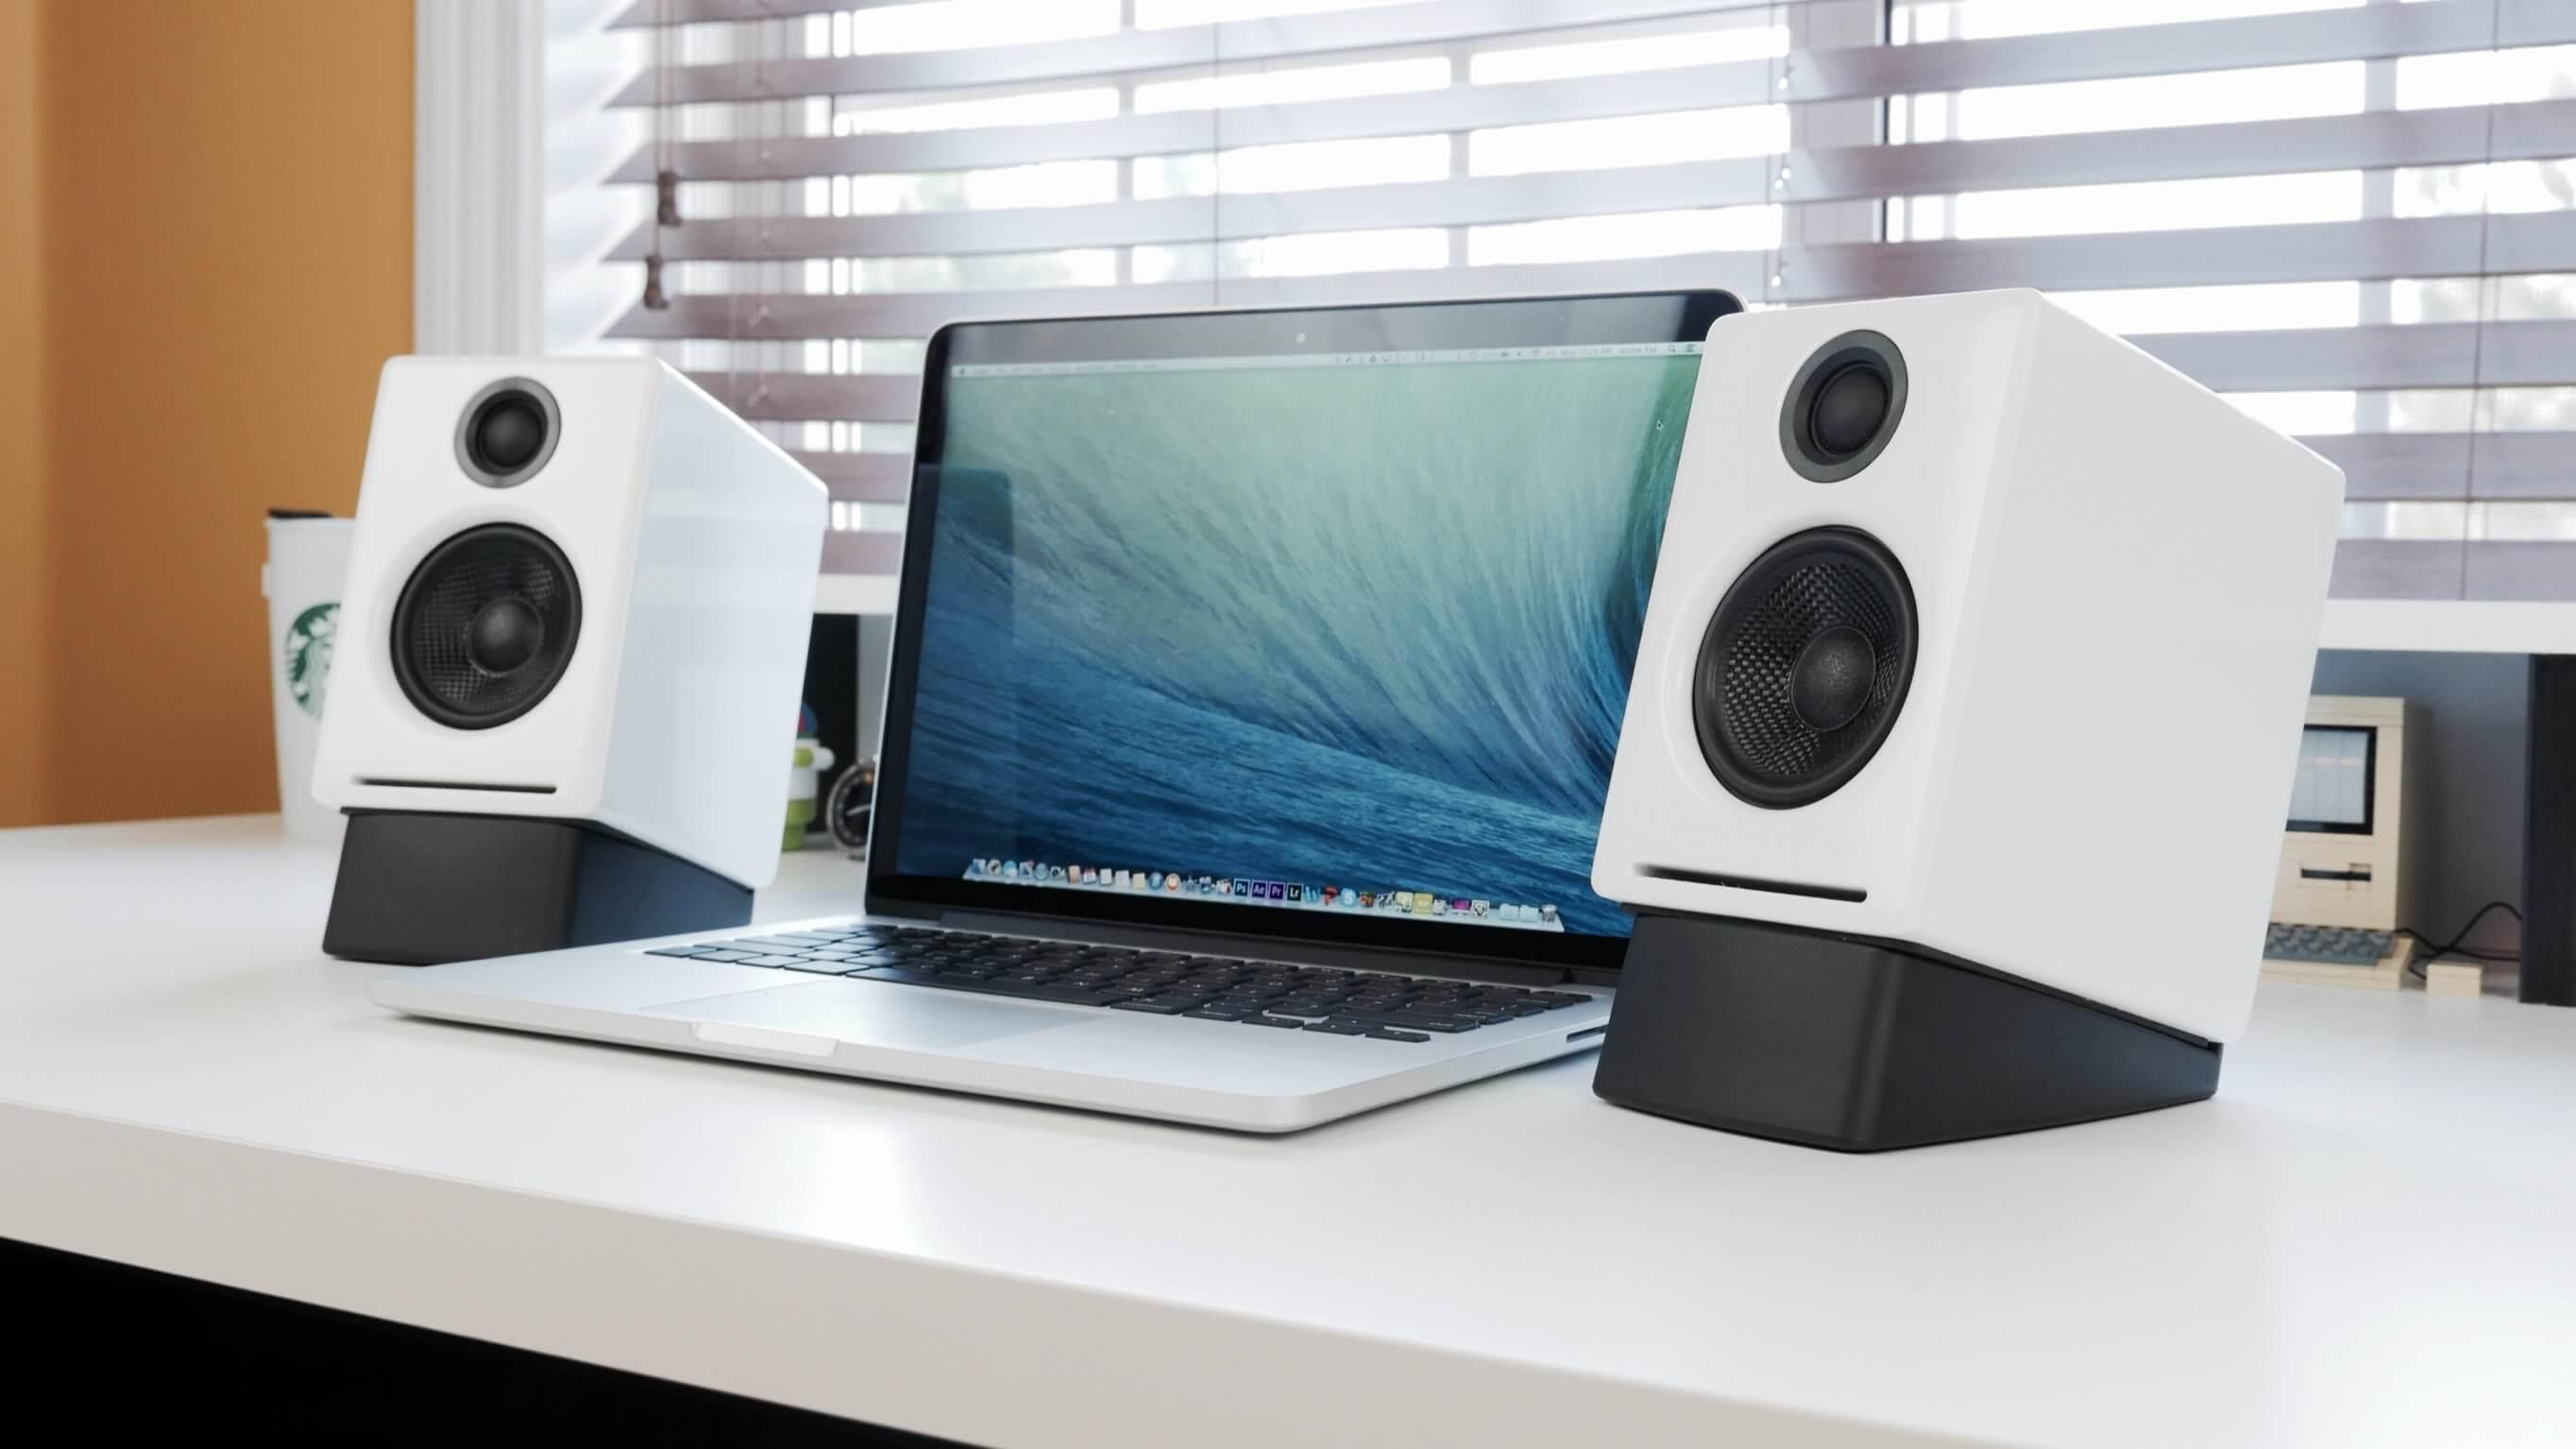 15 Best Computer Speakers Under 100 and 50 Dollars - ReviewsTook